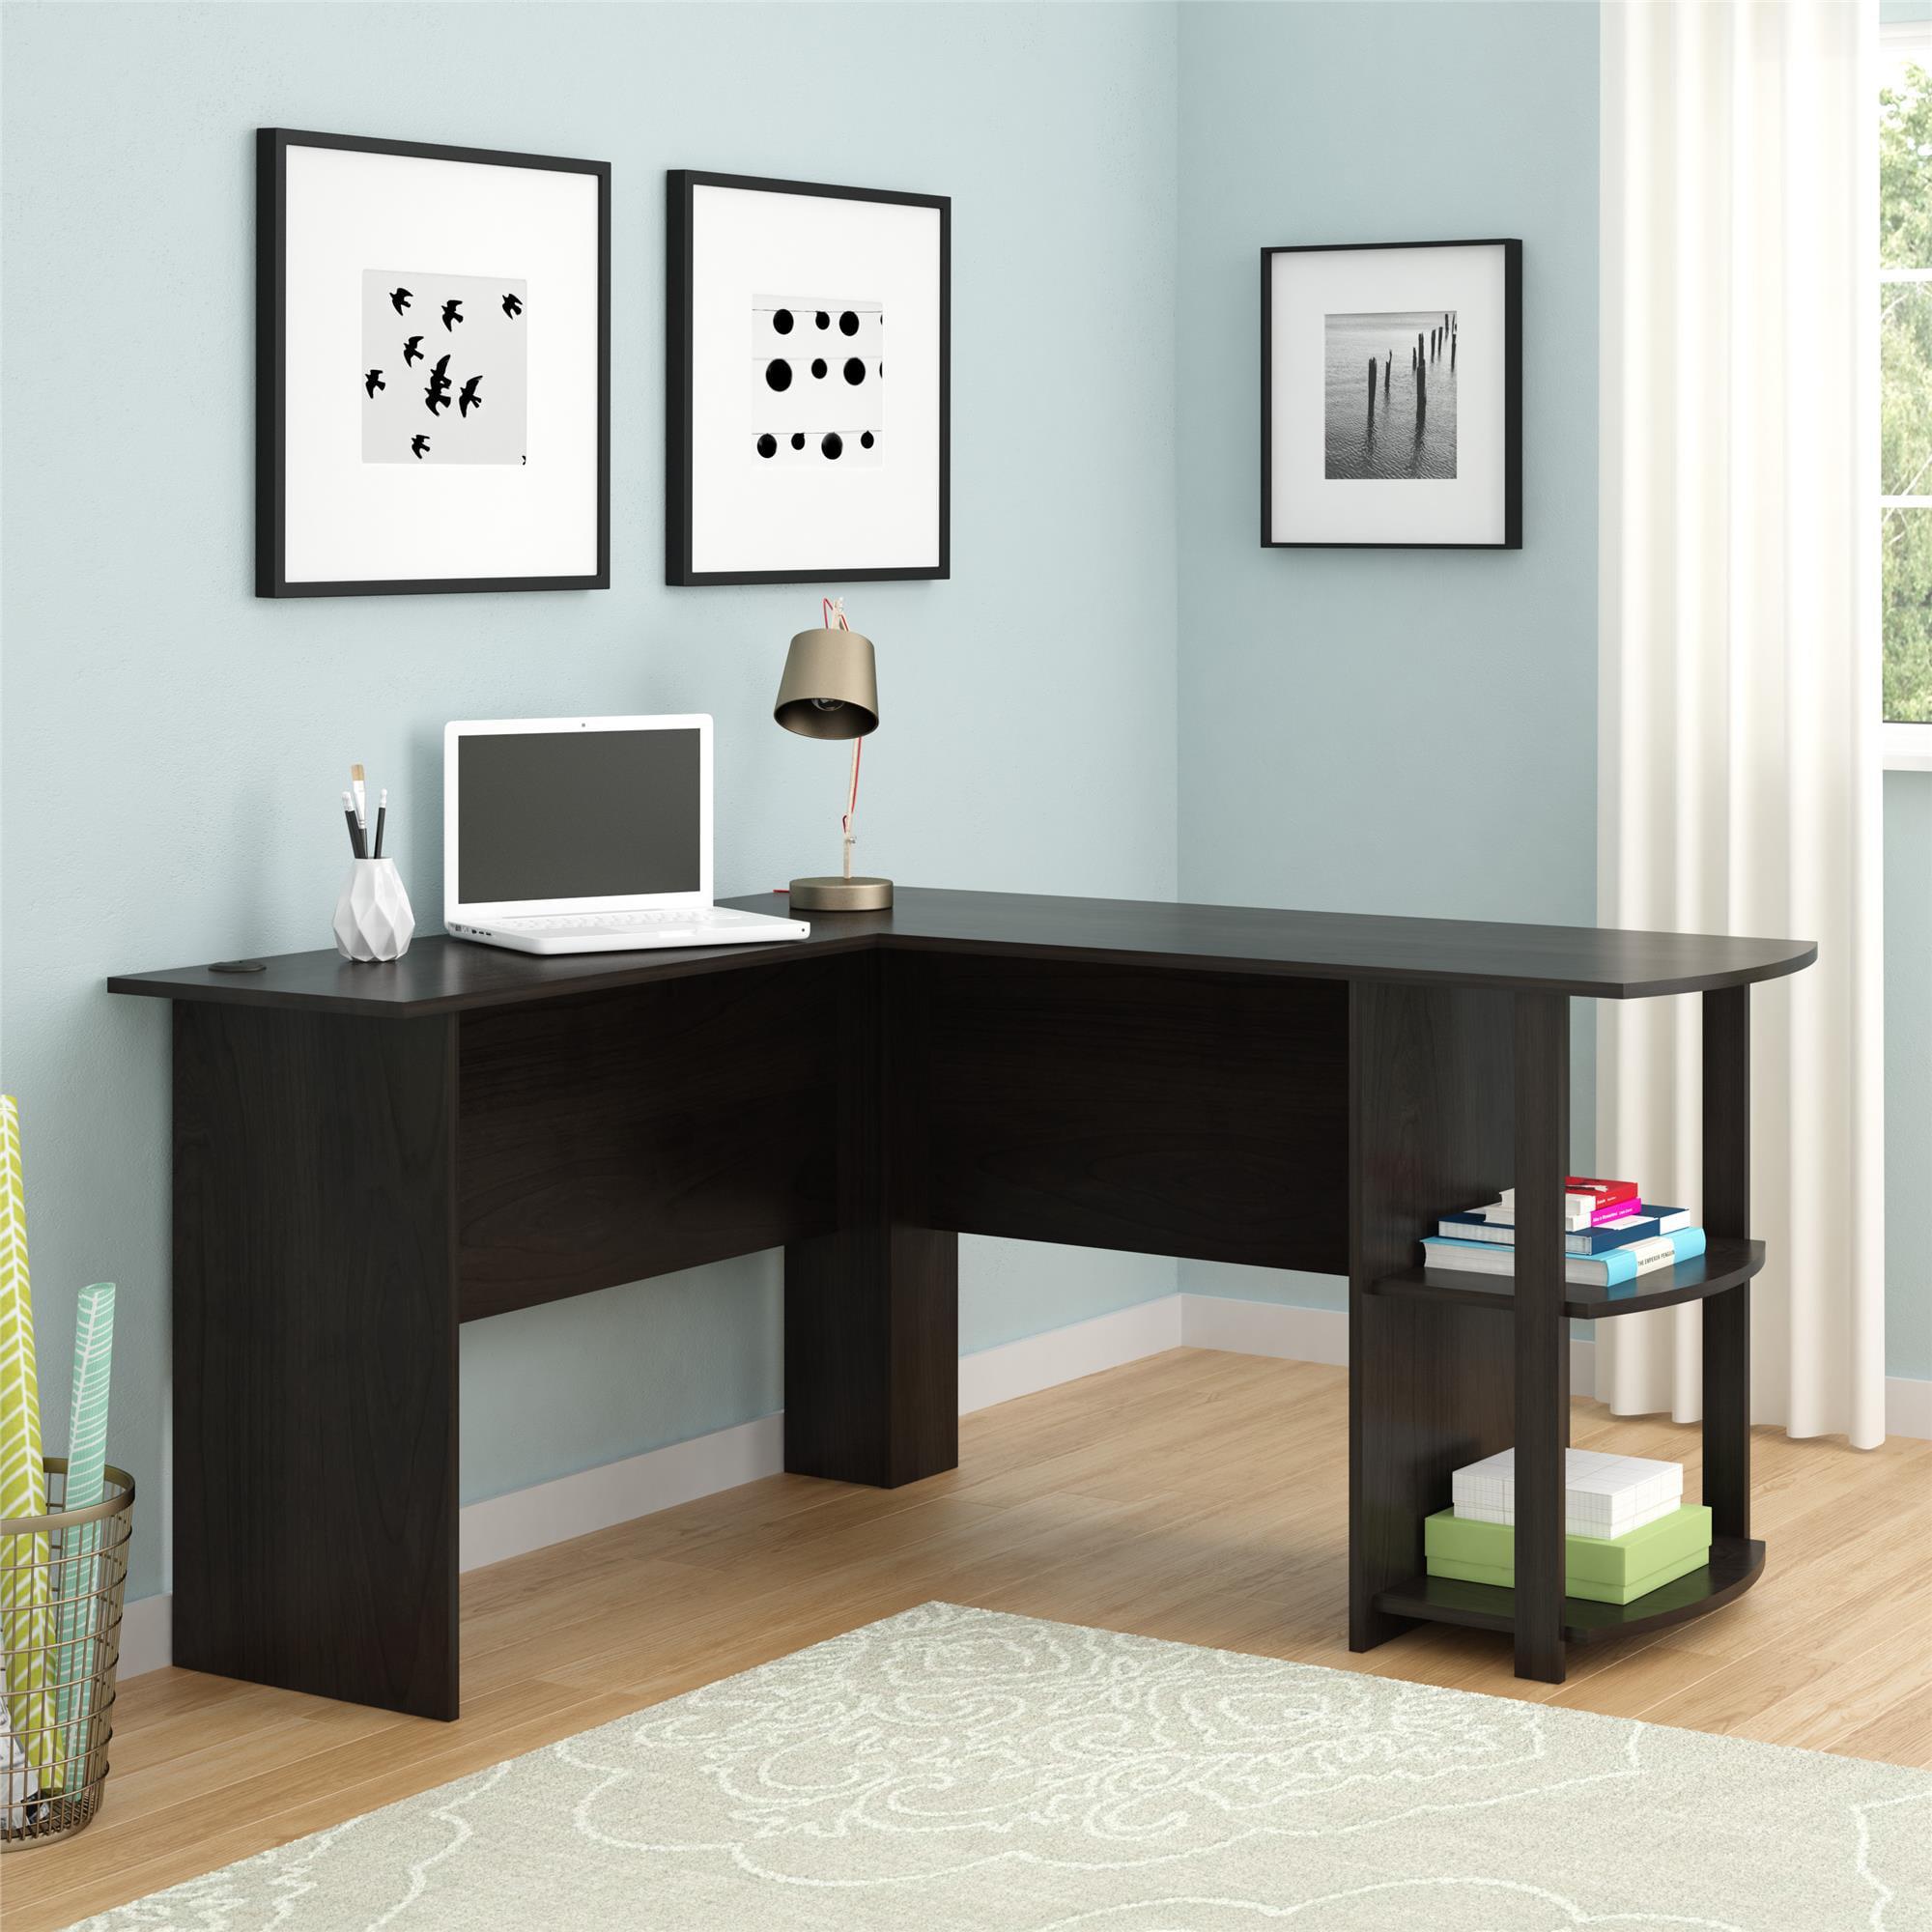 Ameriwood Home Dominic L Desk With Bookshelves Espresso Walmart Com Walmart Com